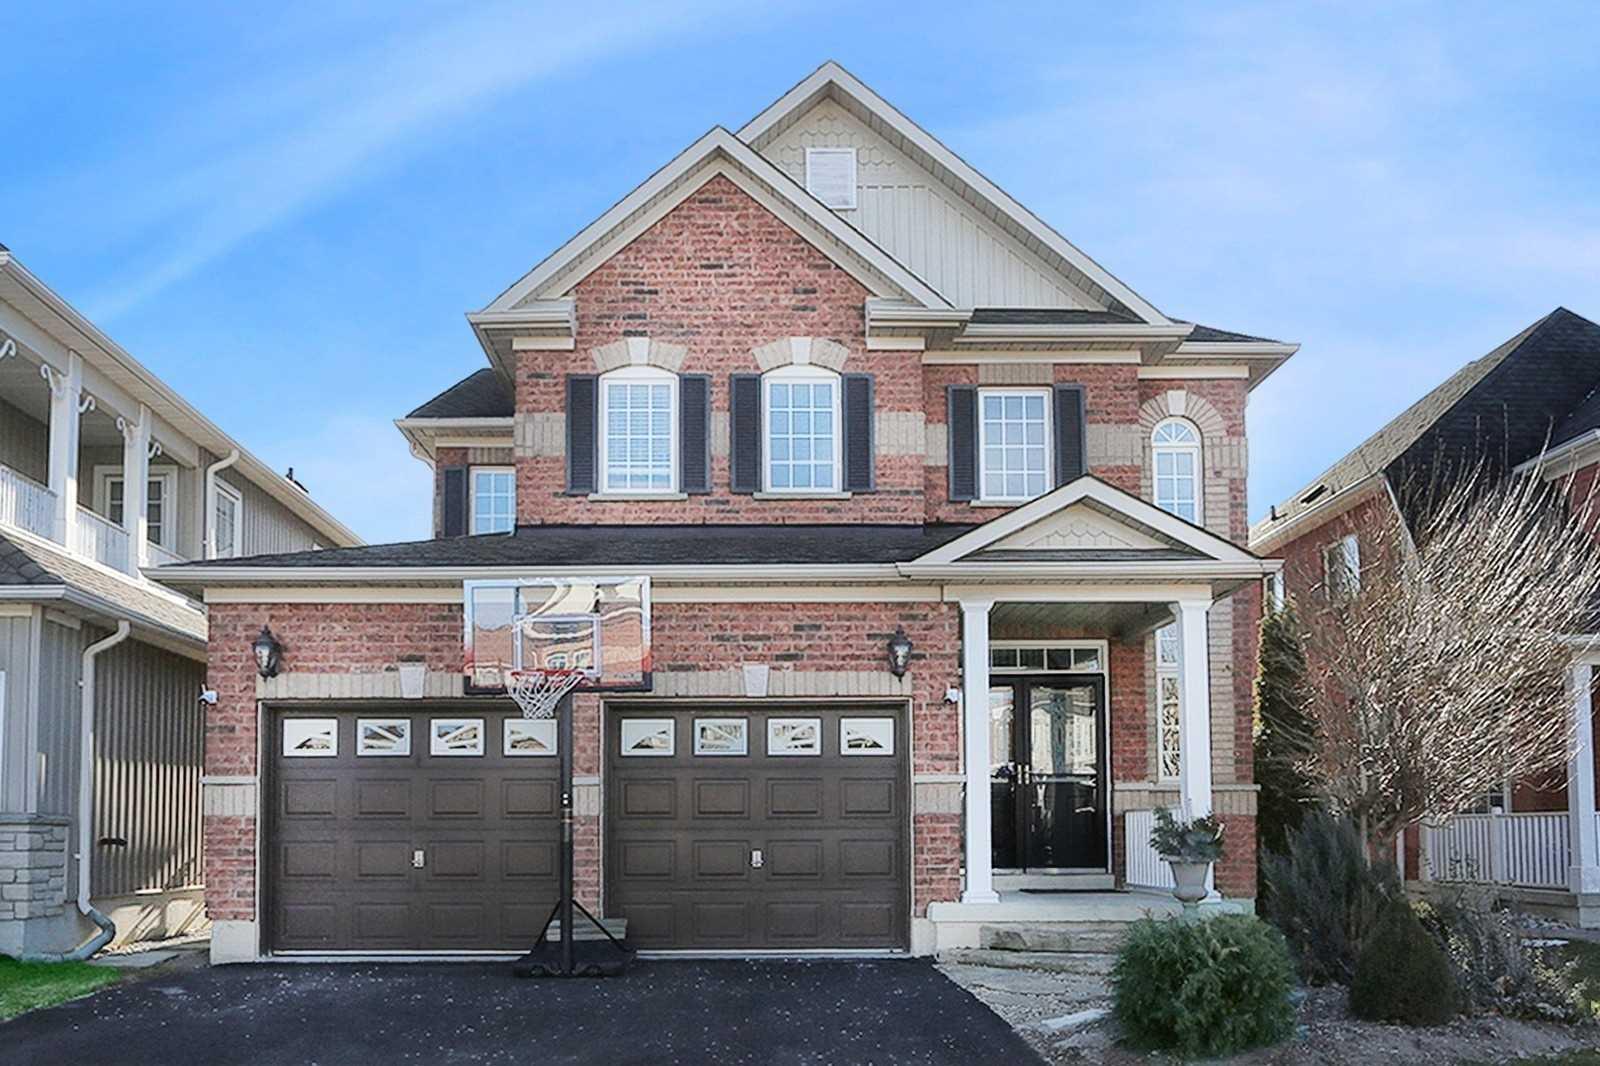 House for sale at 23 Ravey Street Clarington Ontario - MLS: E4338465